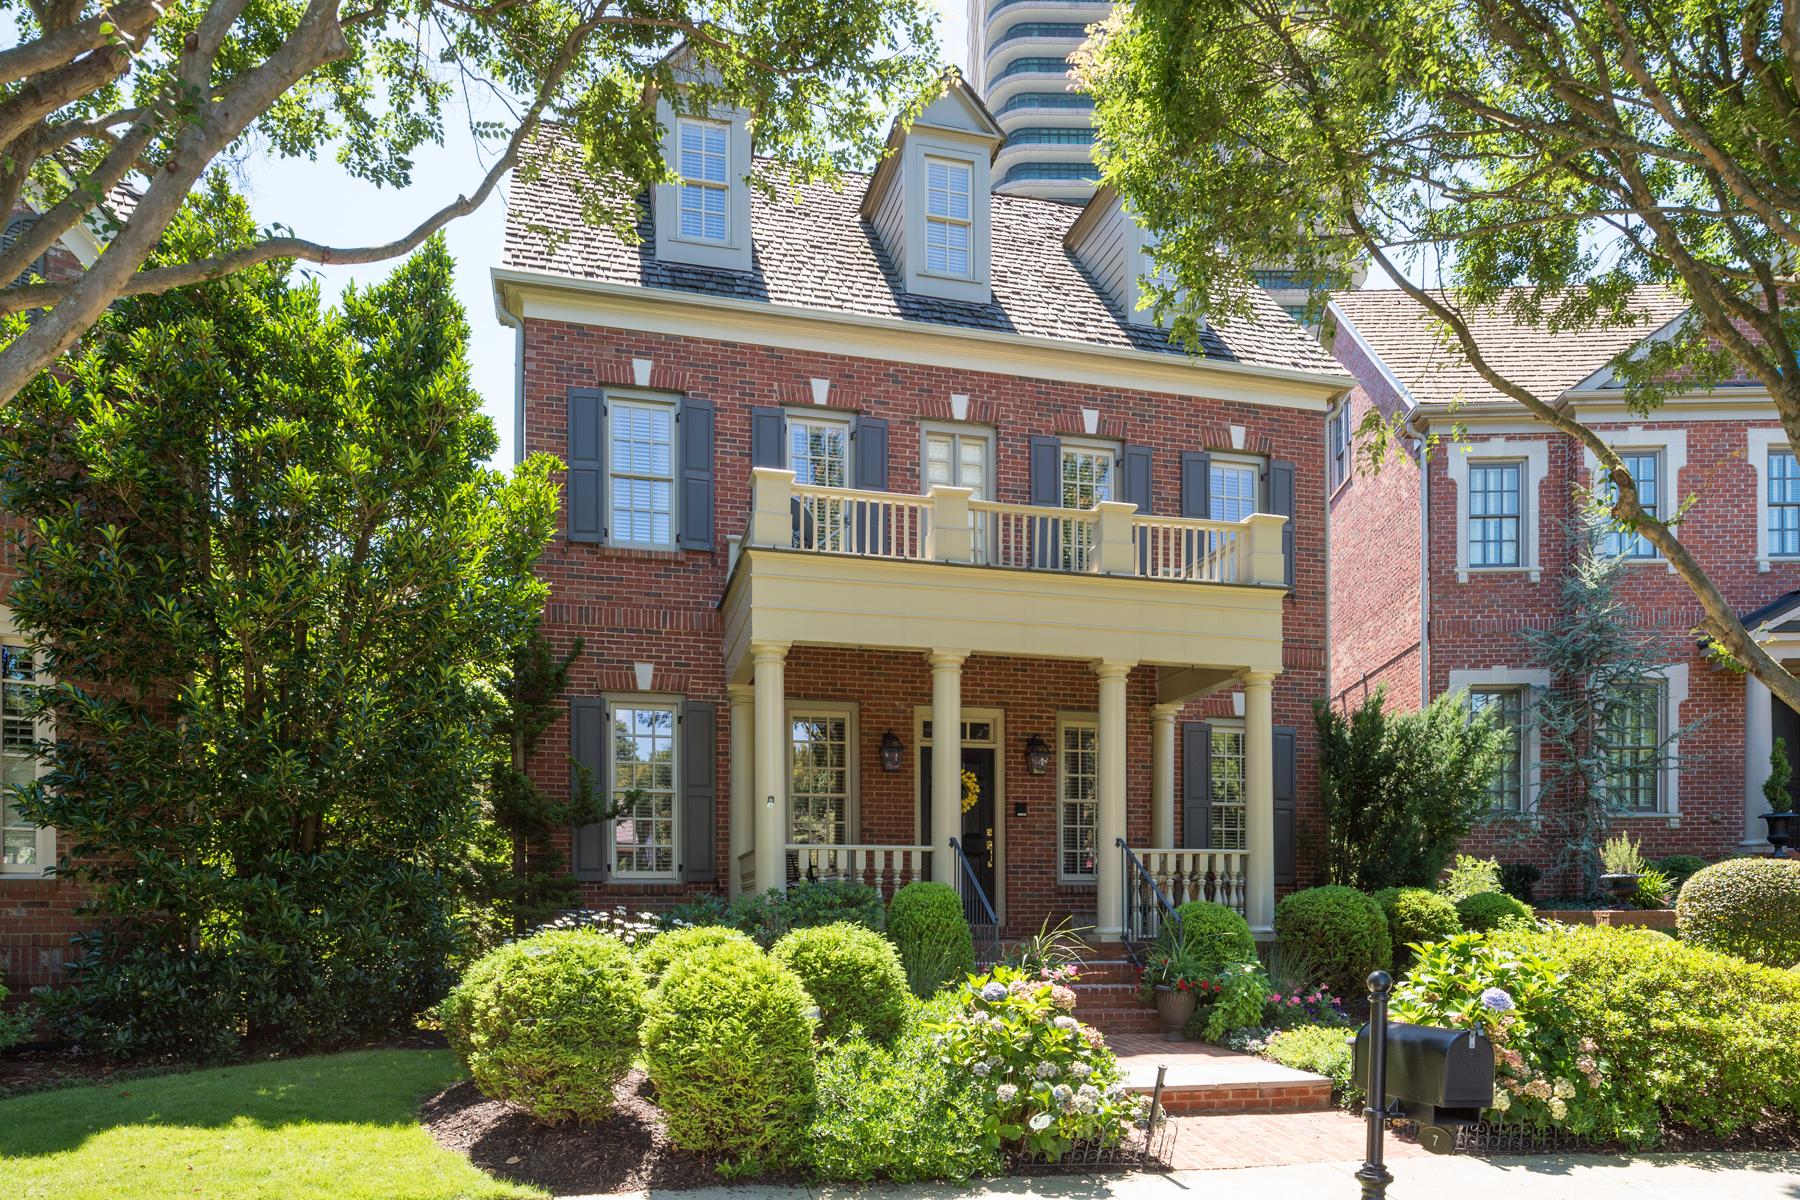 Single Family Home for Sale at Turnkey Home in Longleaf 7 Conifer Circle NE Atlanta, Georgia 30342 United States